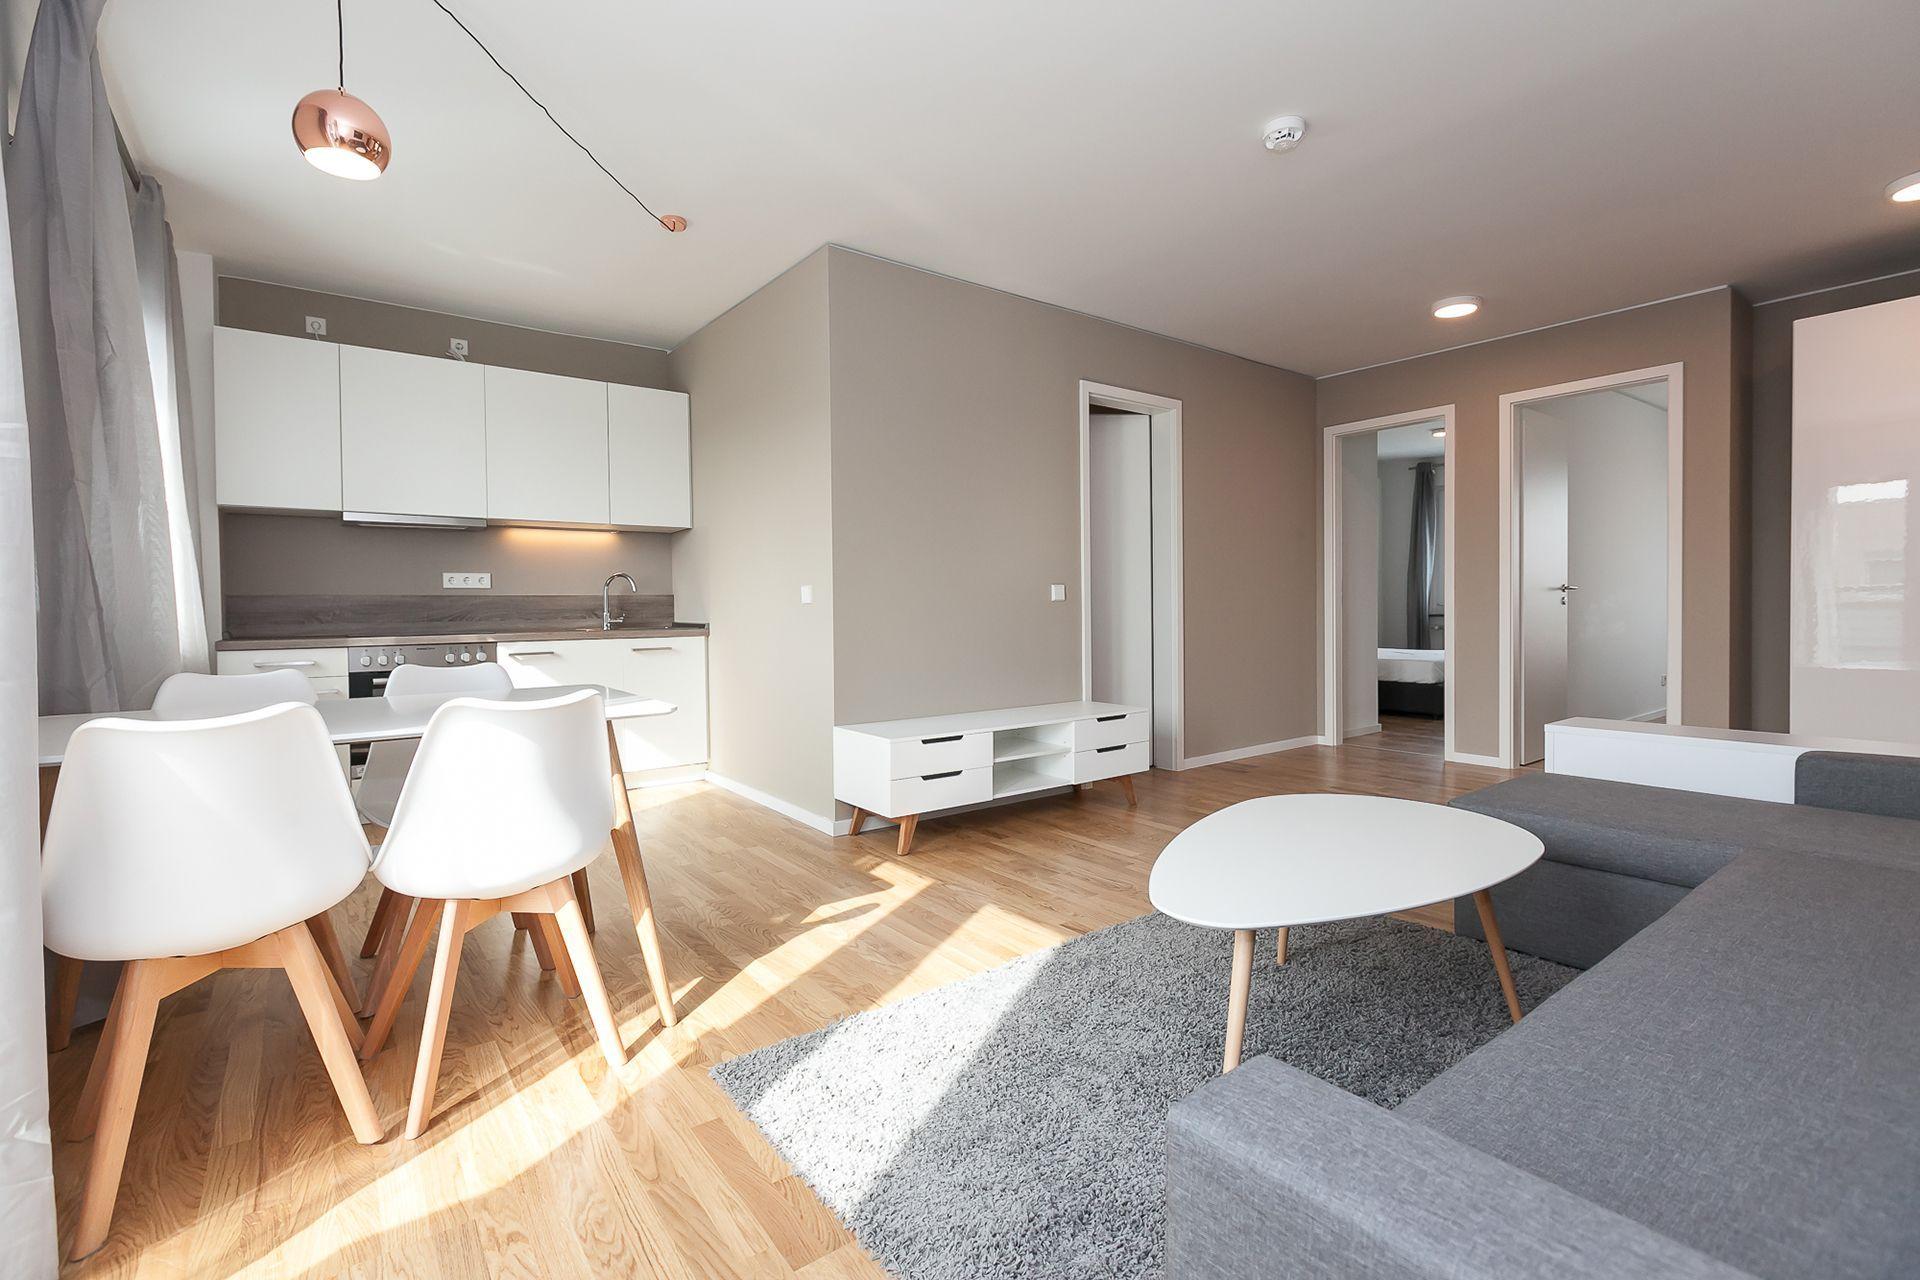 2 Bedroom - Medium apartment to rent in Berlin KOEP-KOEP-0409-0